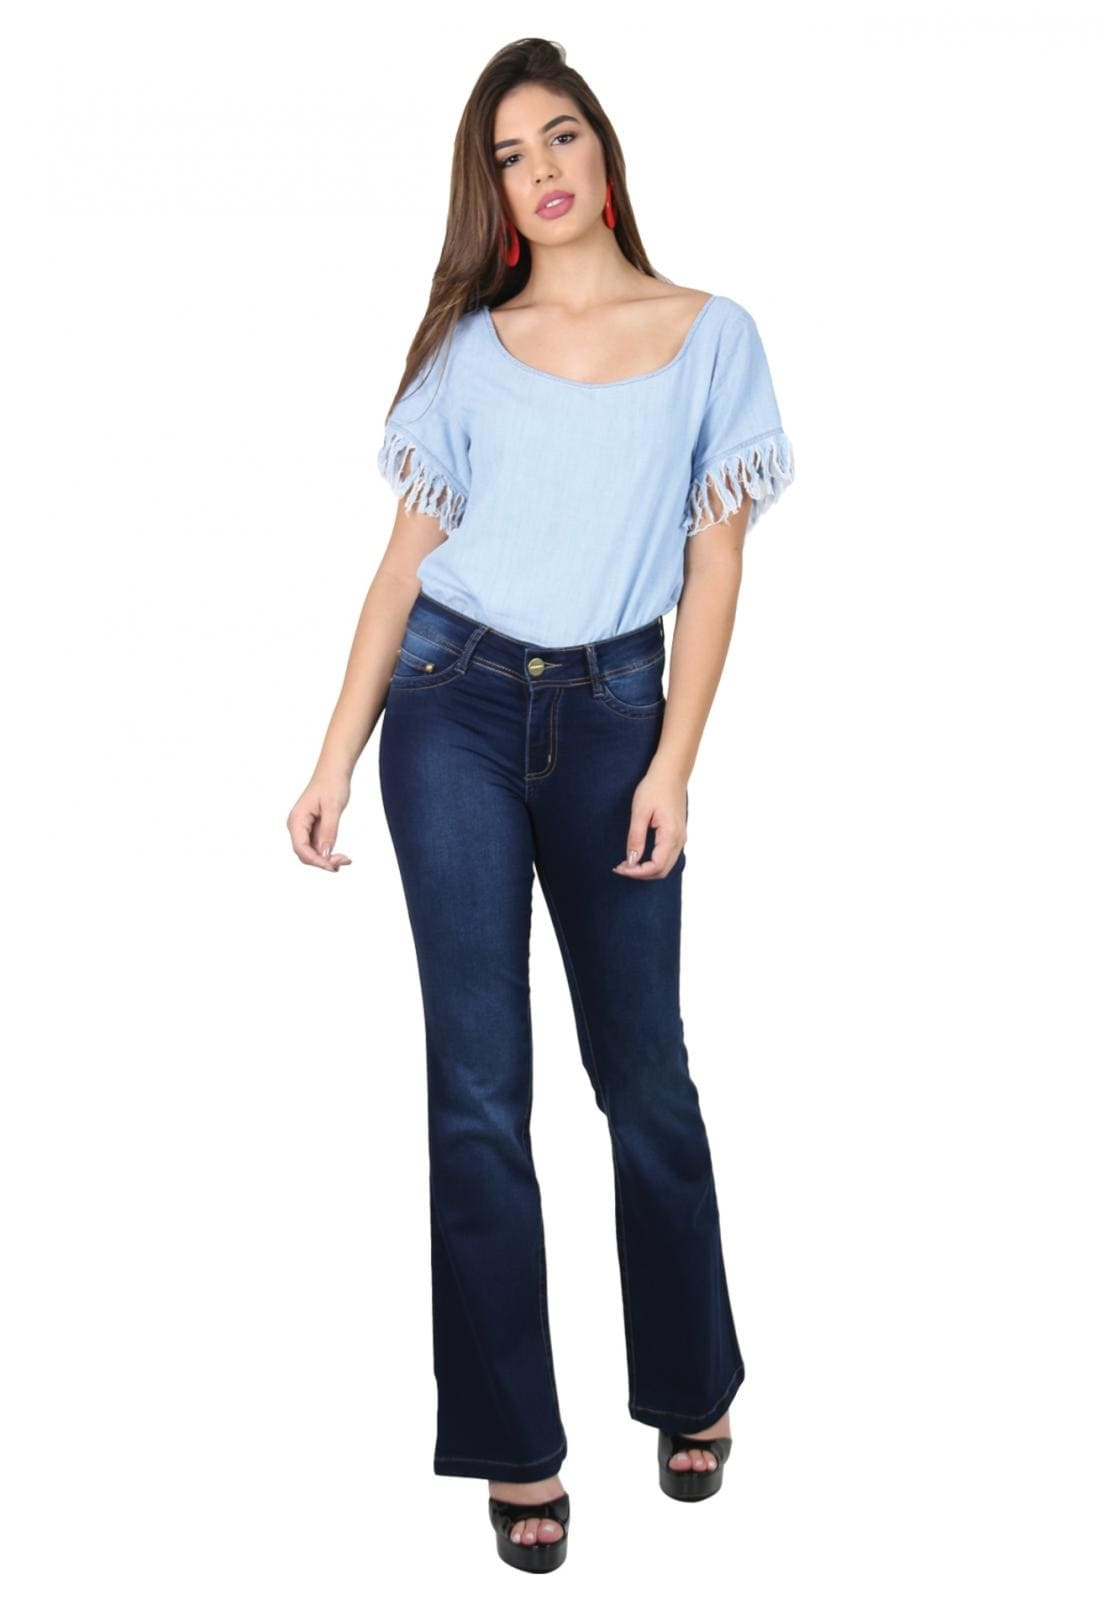 Calça Jeans Feminina Tradicional Flare Azul